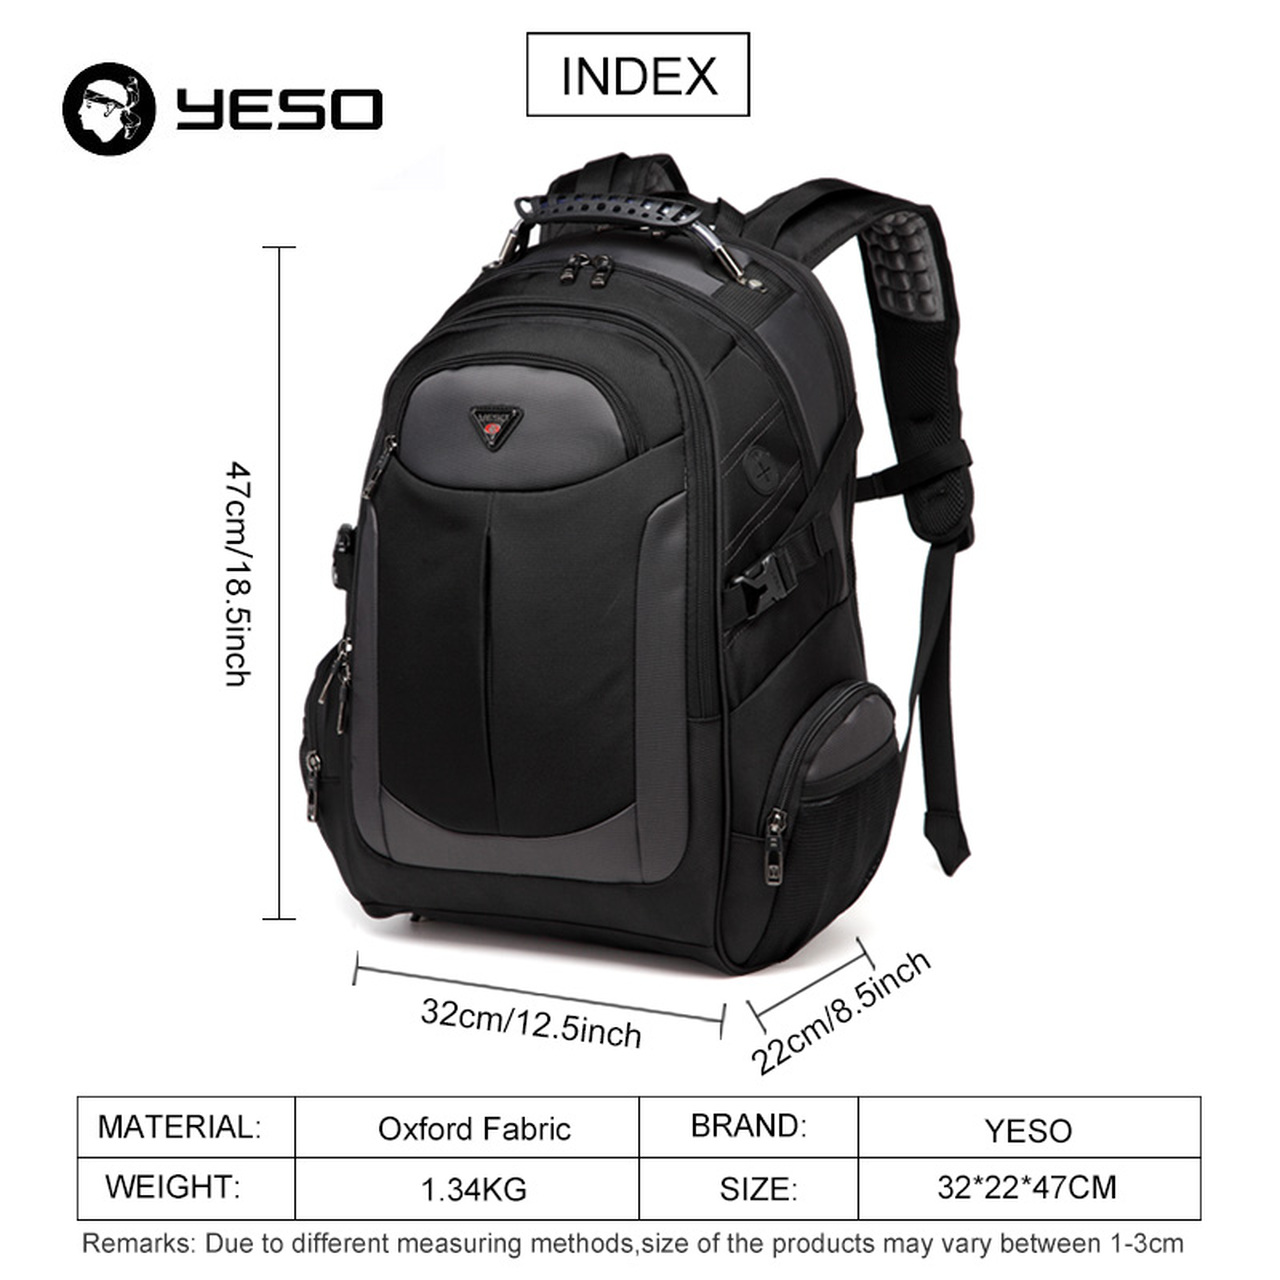 172844c9a76 ... YESO Brand Laptop Backpack Men s Travel Bags 2018 Multifunction  Rucksack Waterproof Oxford Black Computer Backpacks For ...